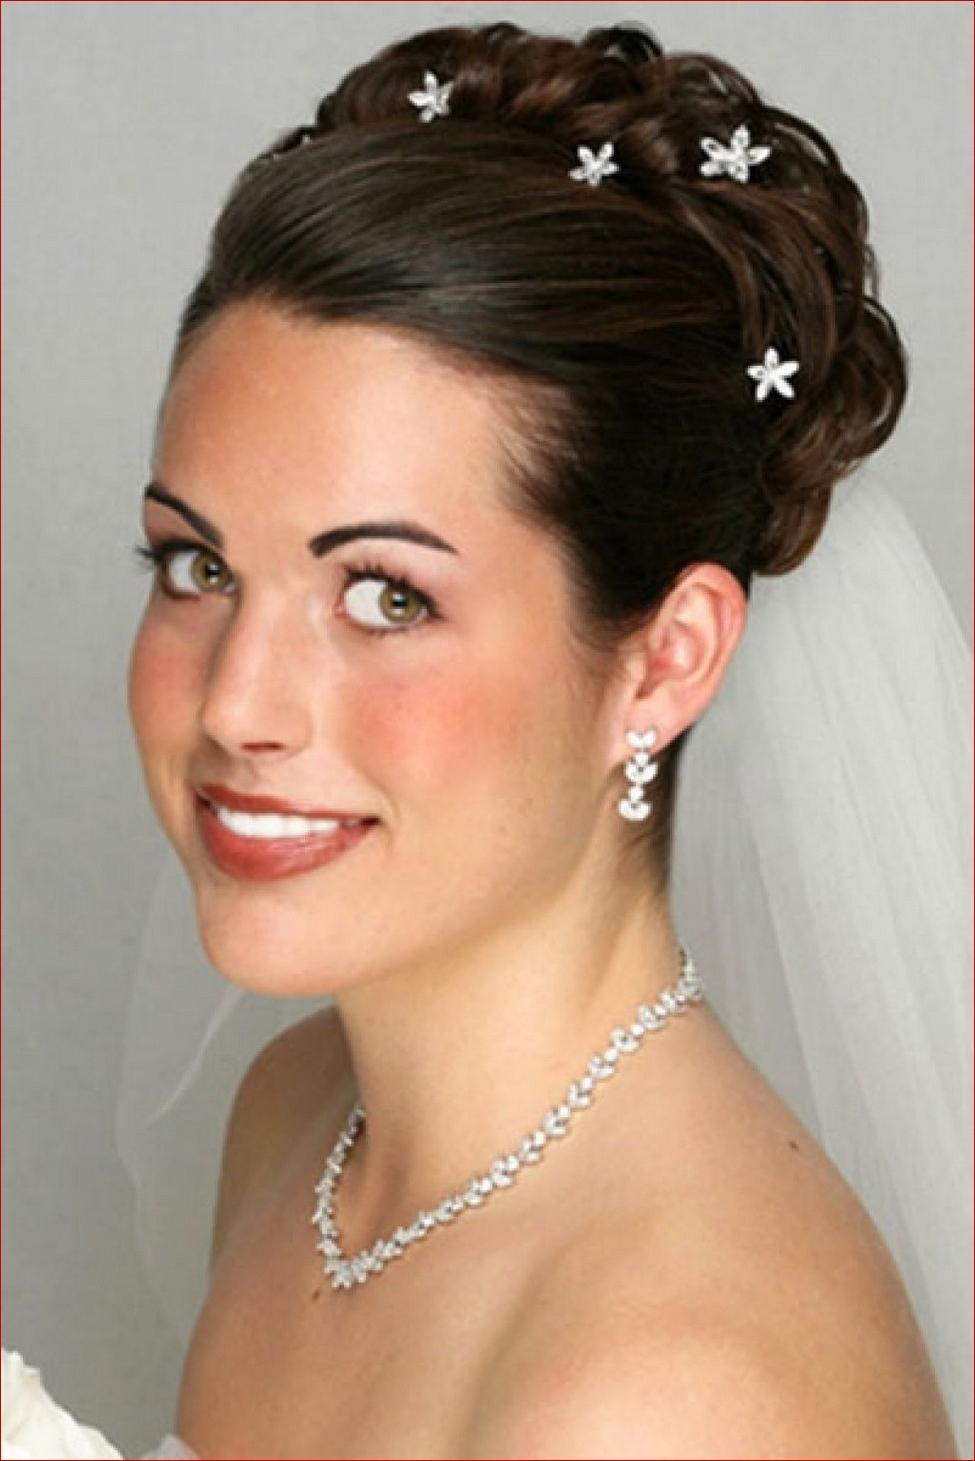 Medium Length Updo Hairstyles For Weddings   Pertaining To Wedding Updos For Medium Length Hair (View 6 of 15)